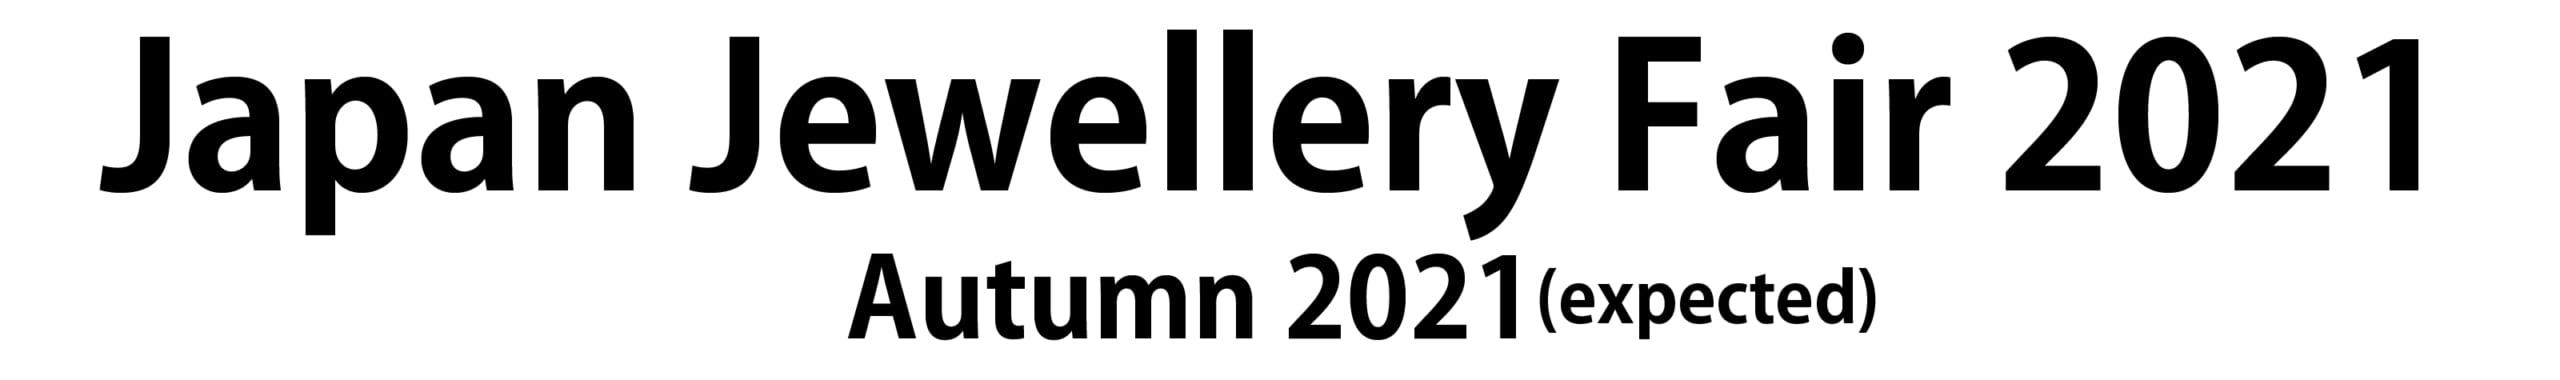 Japan Jewellery Fair  Autum 2021